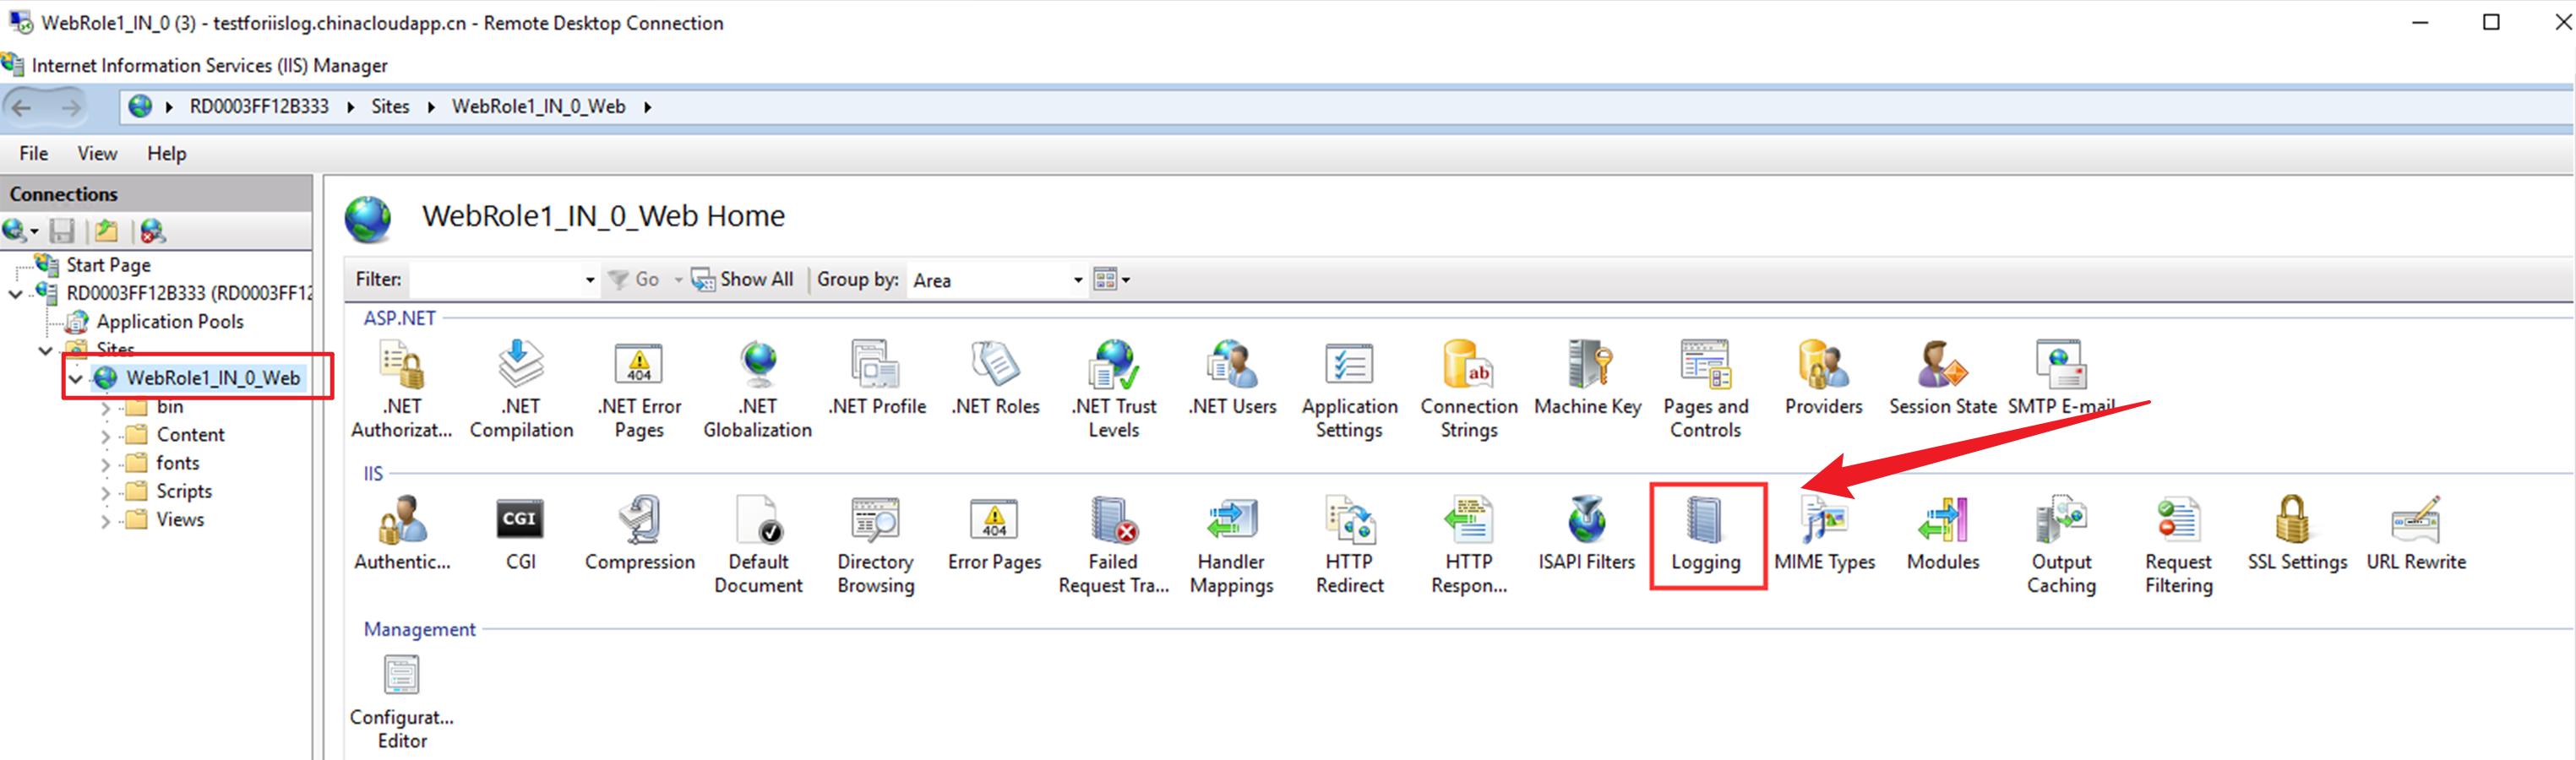 【Azure 雲服務】Azure Cloud Service 為 Web Role(IIS Host)增加自定義欄位 (把HTTP Request Header中的User-Agent欄位增加到IIS輸出日誌中)